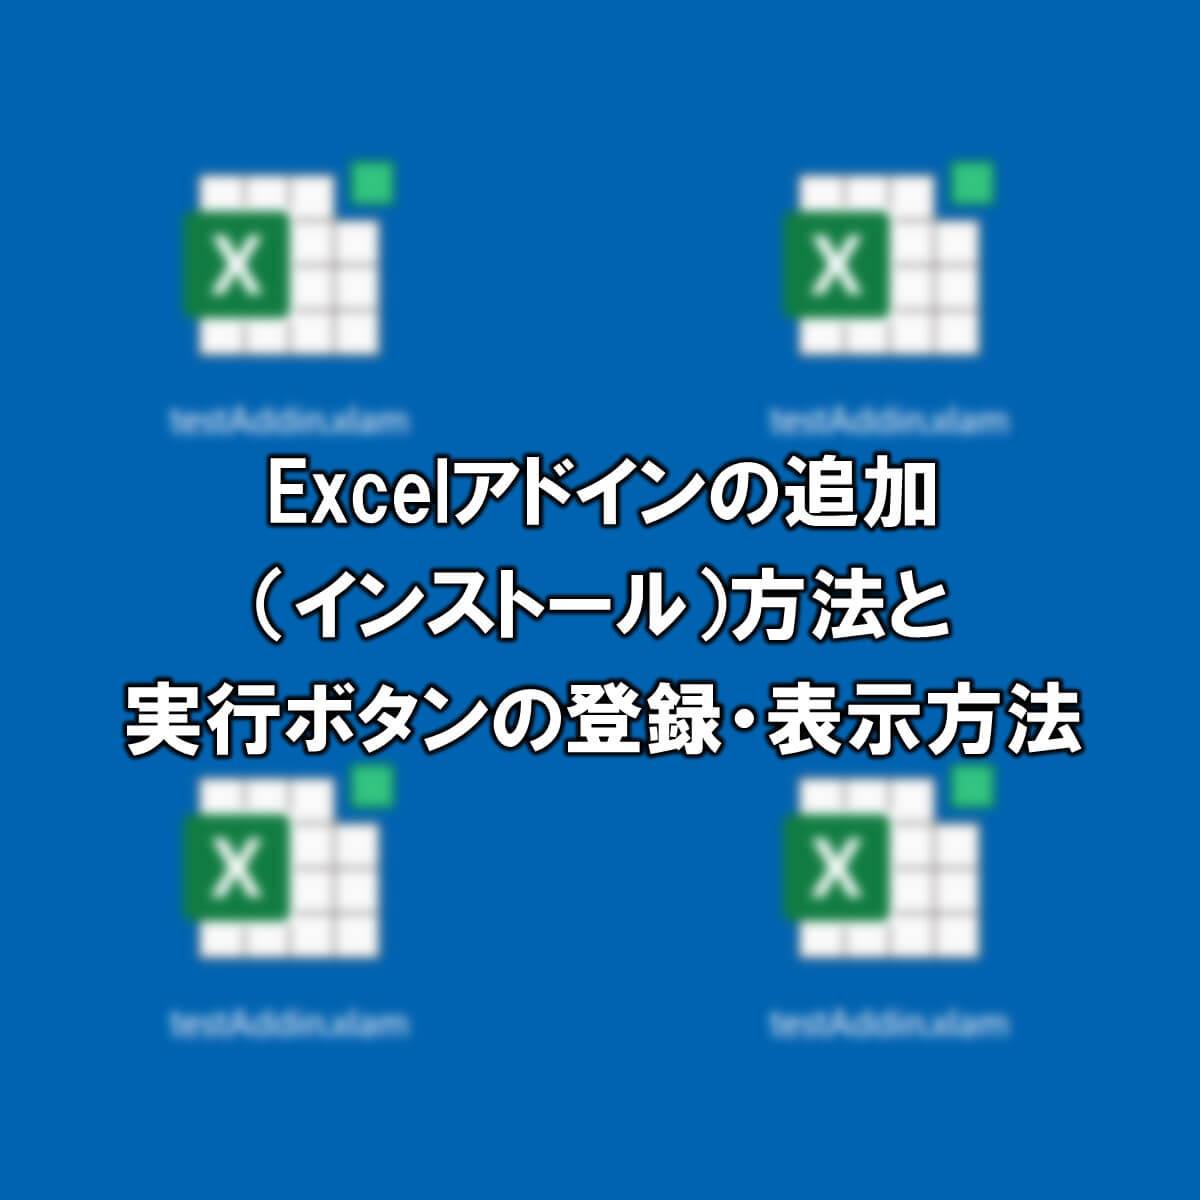 Excelアドインの追加(インストール)方法と実行ボタンの登録・表示方法